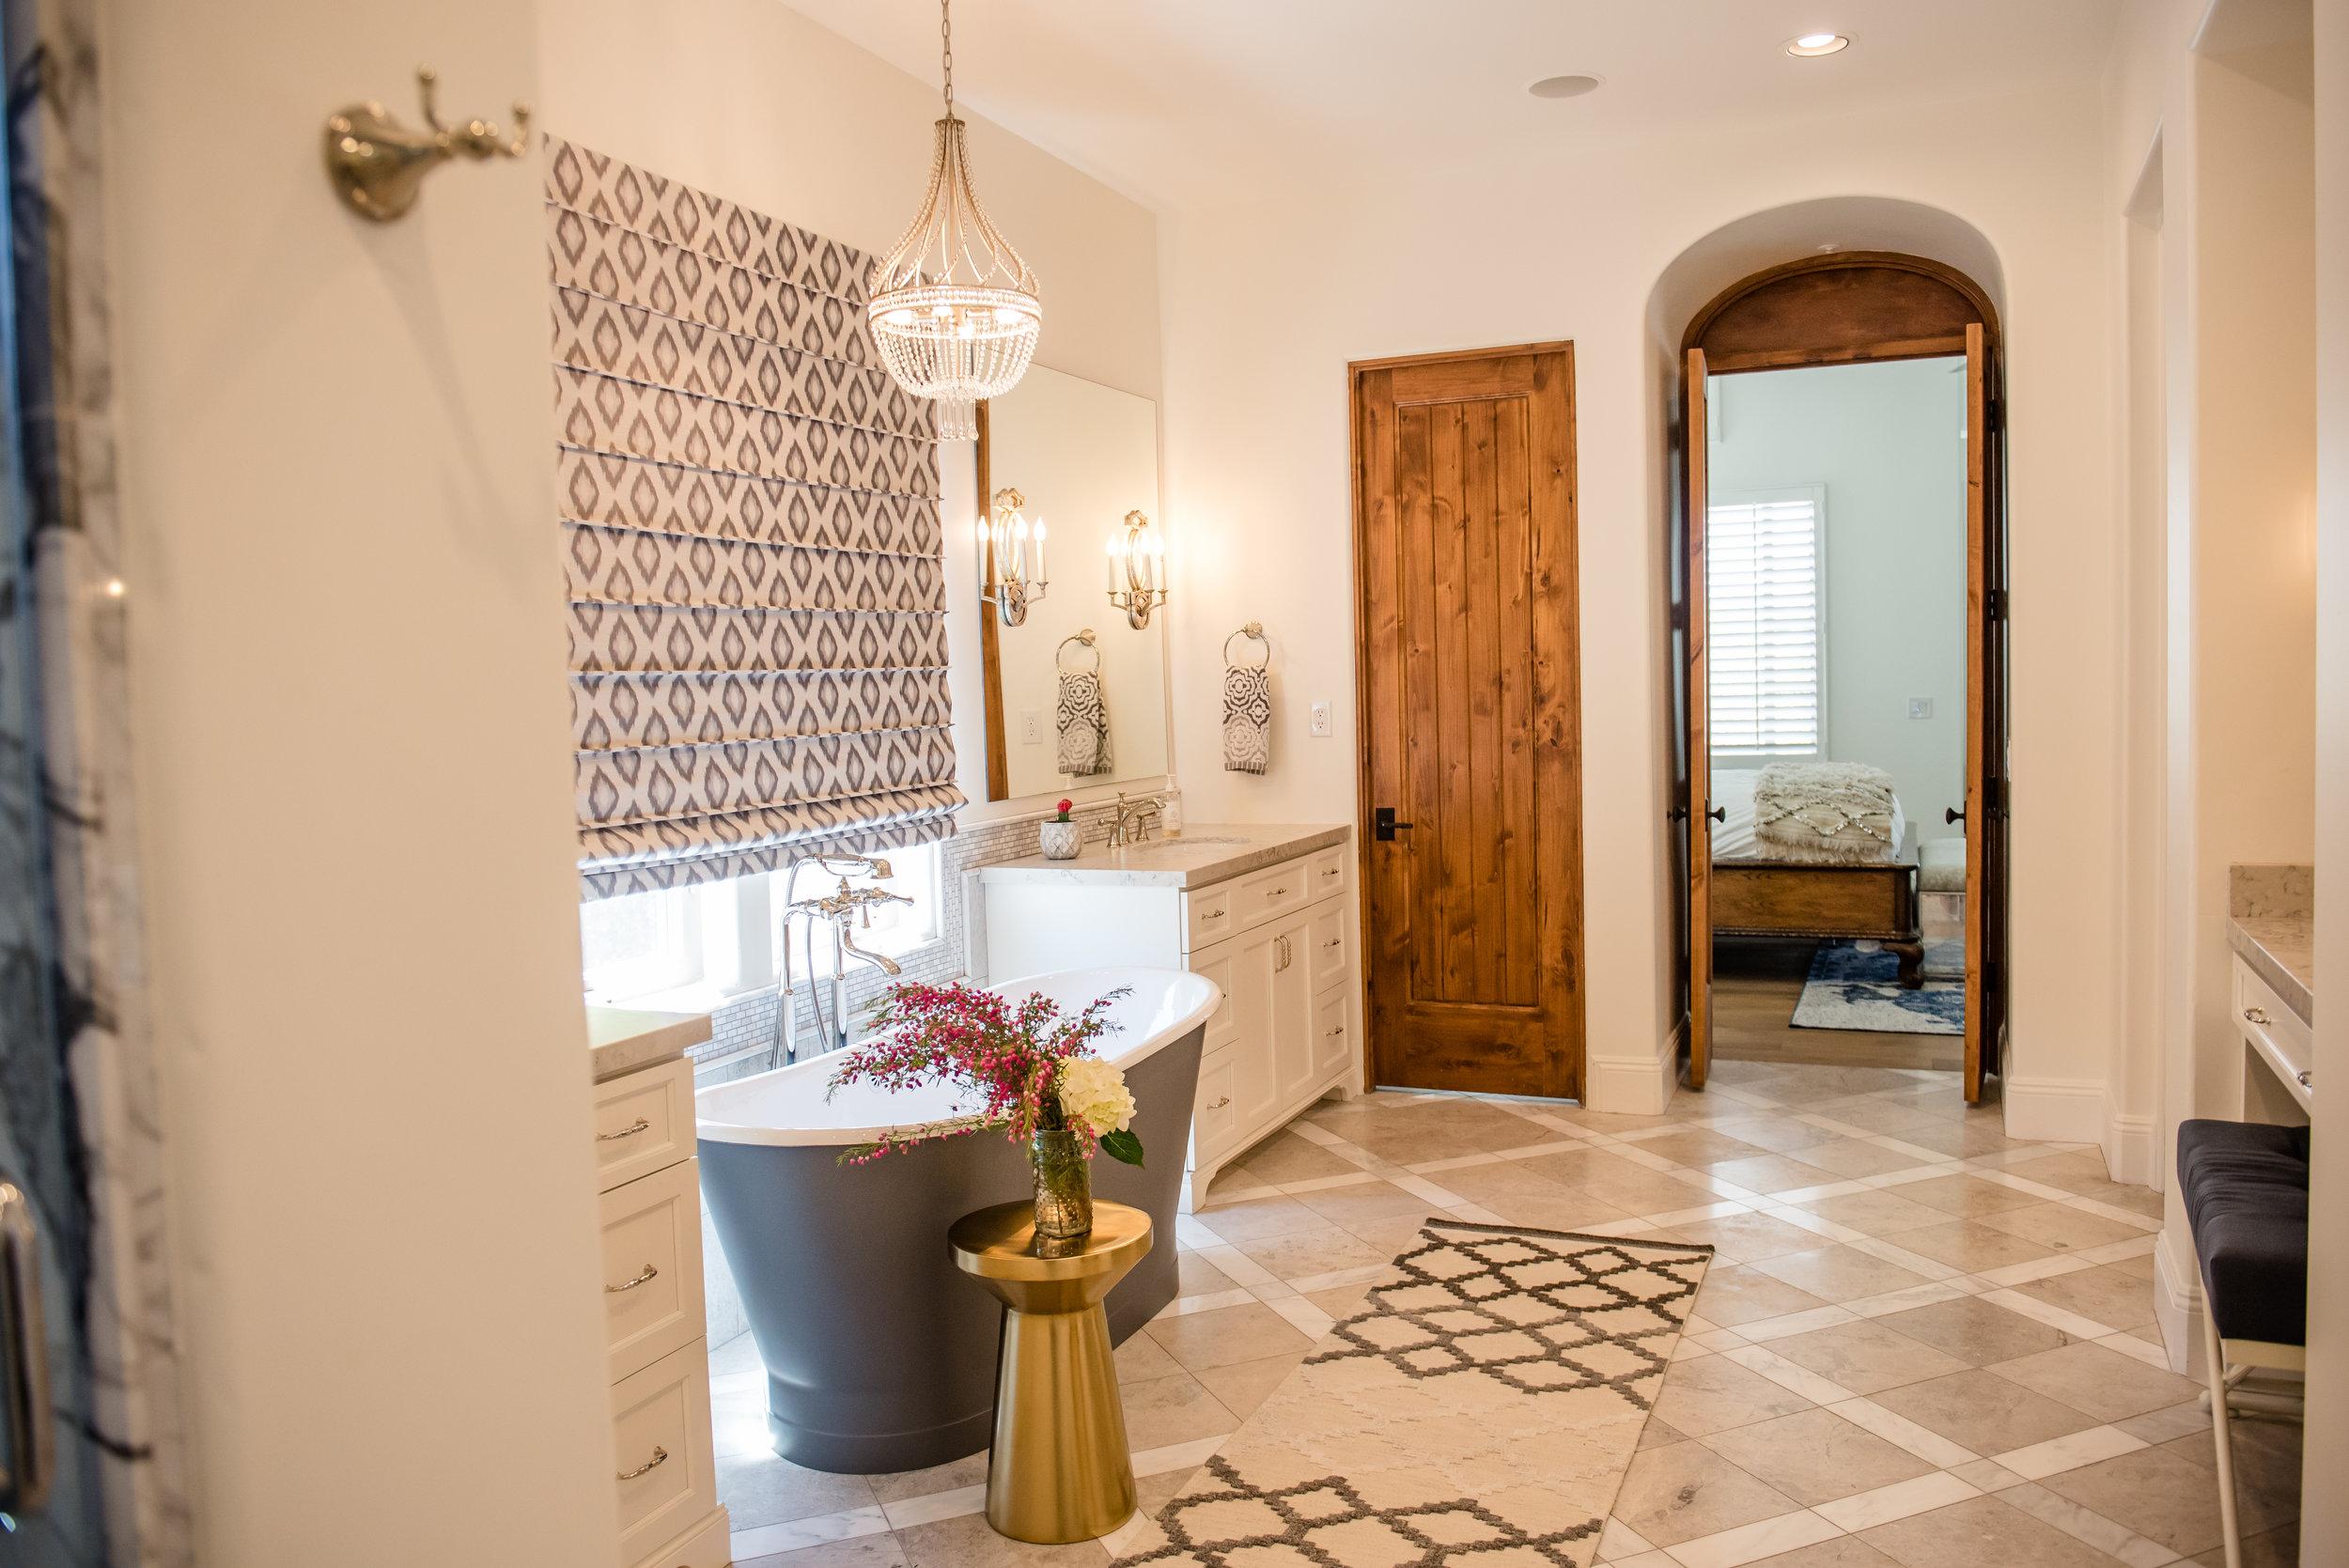 37+masterbath+romanshade+marble+inlayfloor+graybathtub+vanity+chandelier+runner.jpg